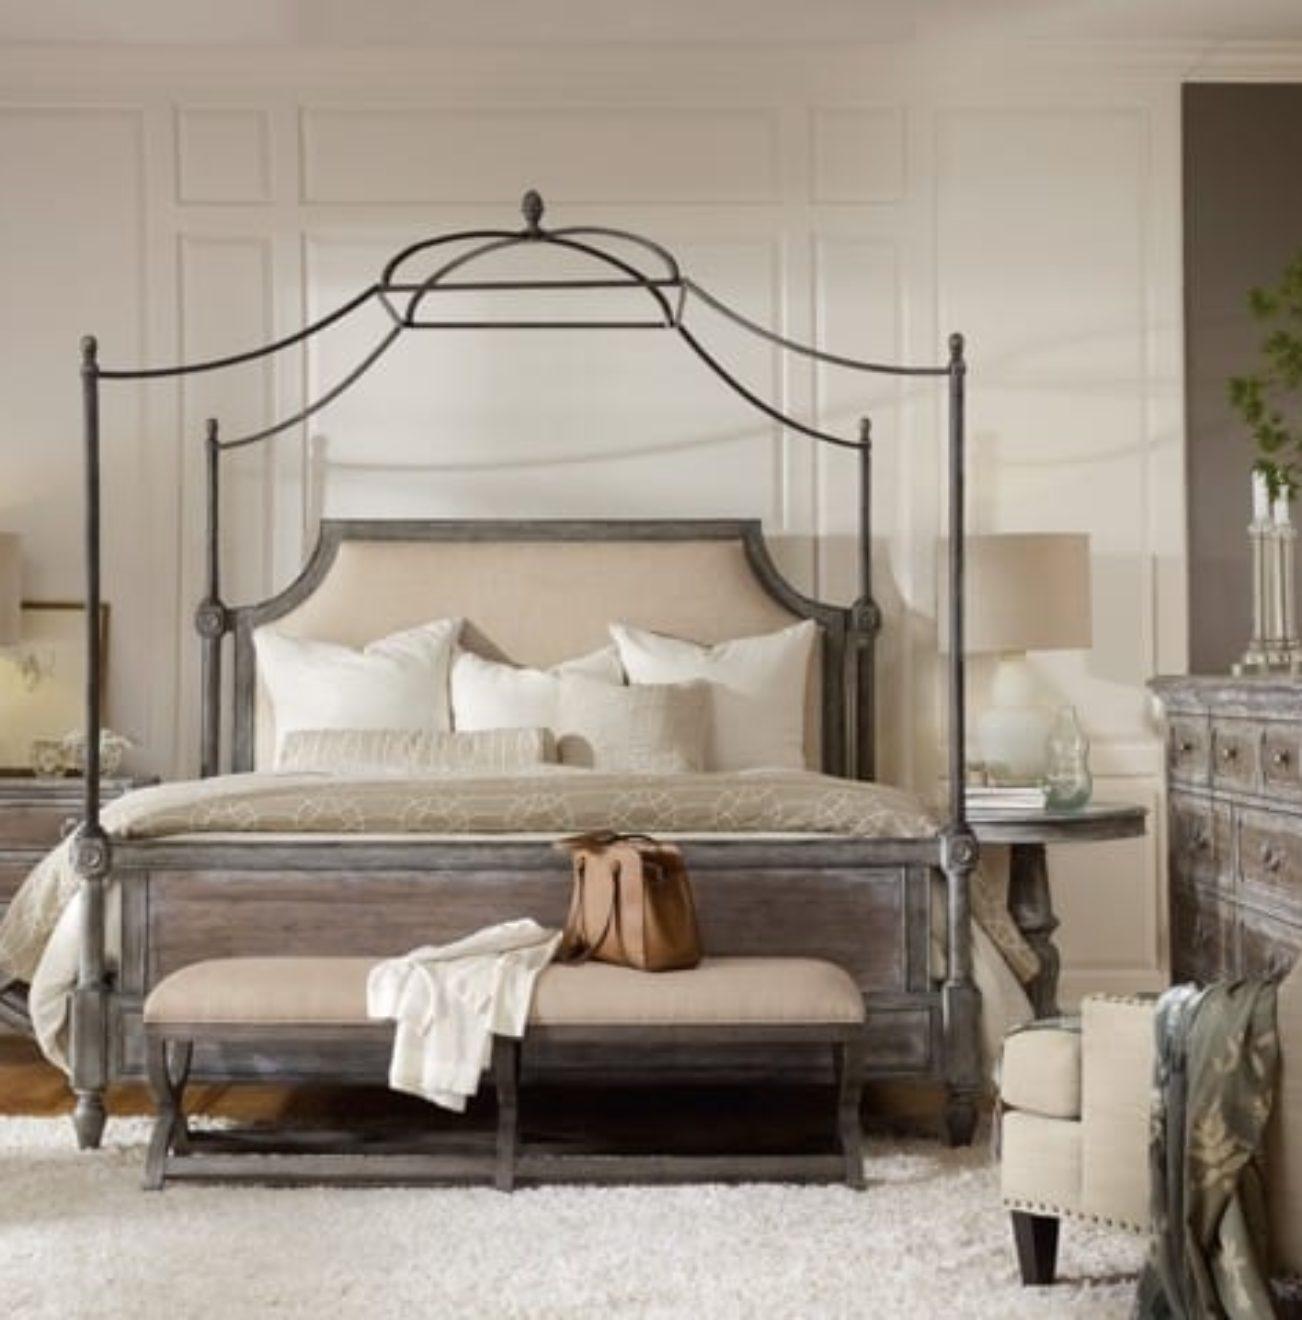 Hooker 5701-90166 bedroom